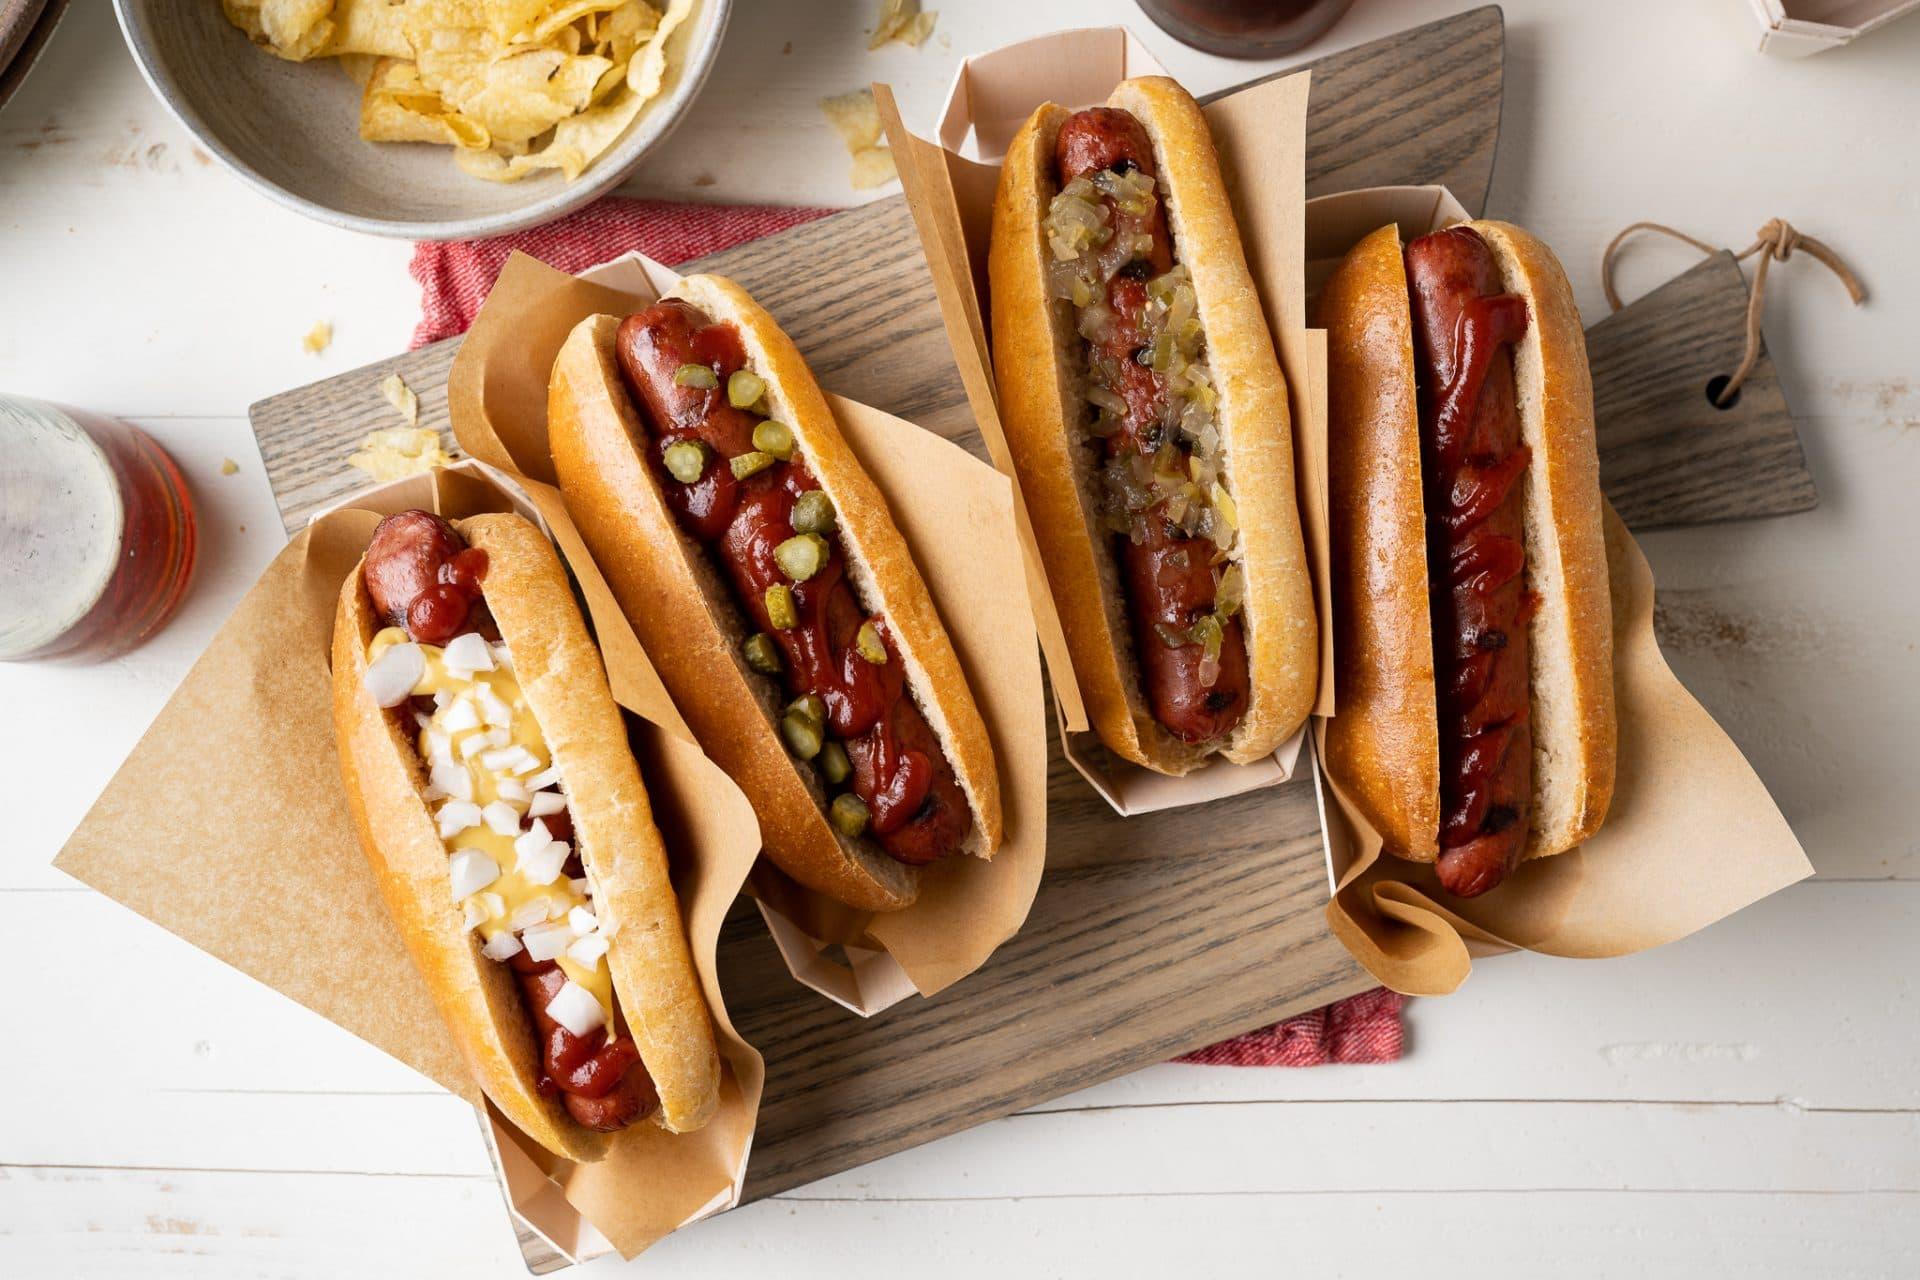 Homemade hot dog buns